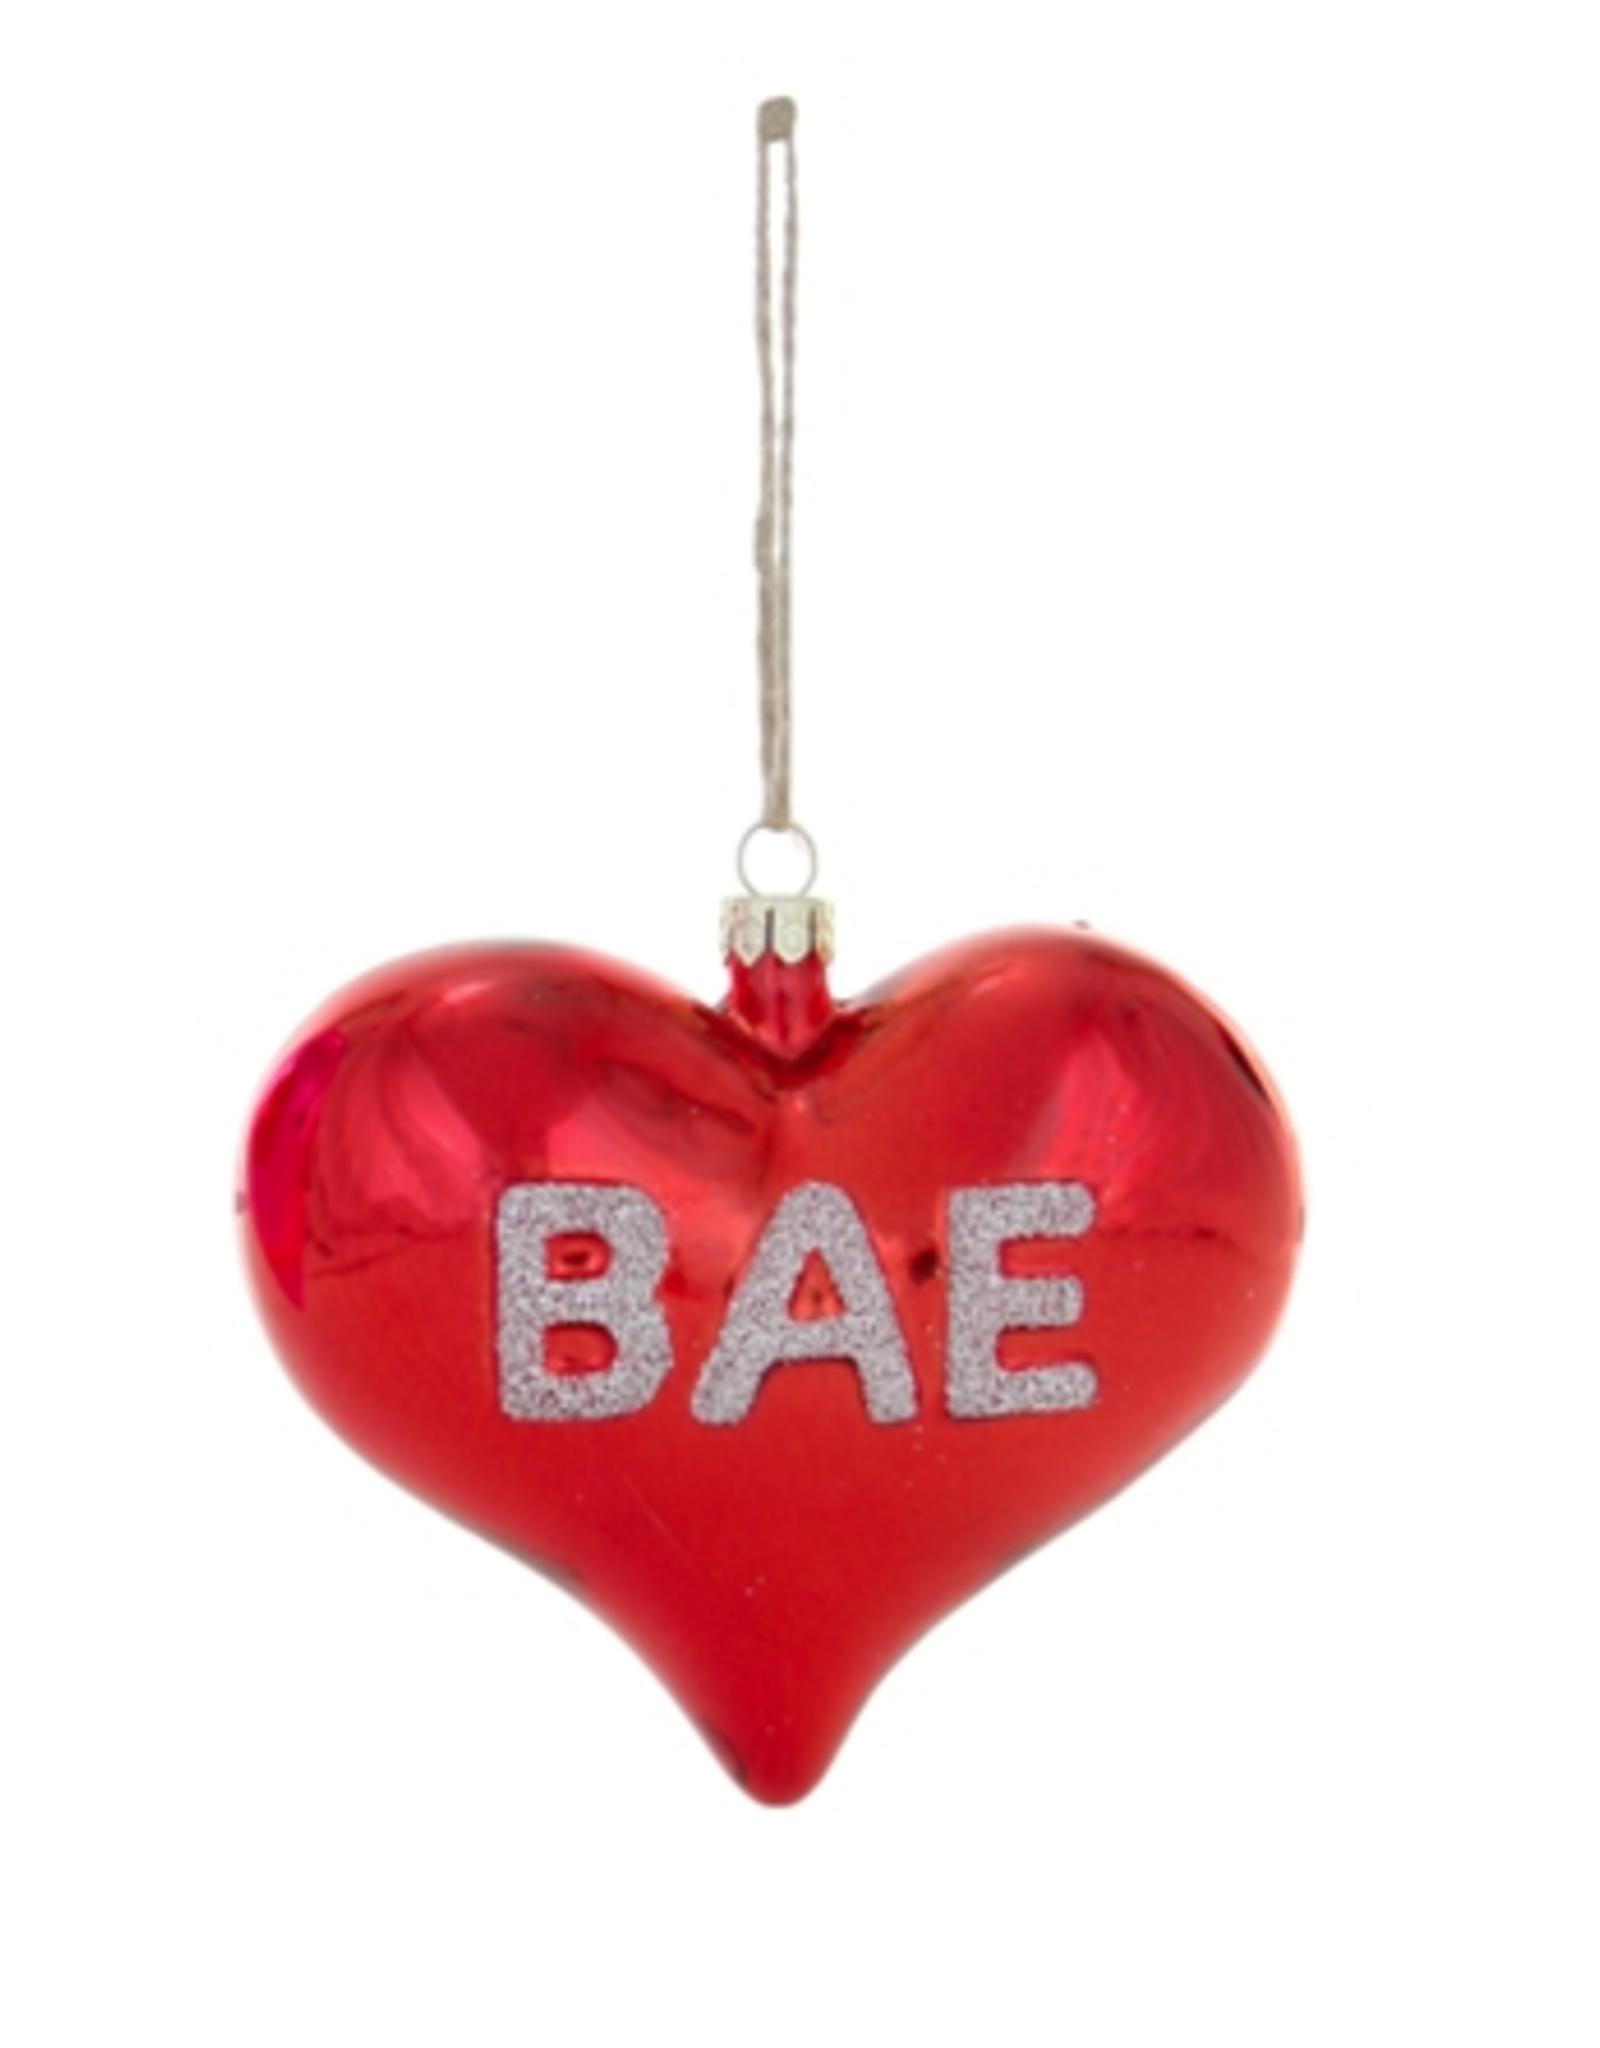 Bae Ornament